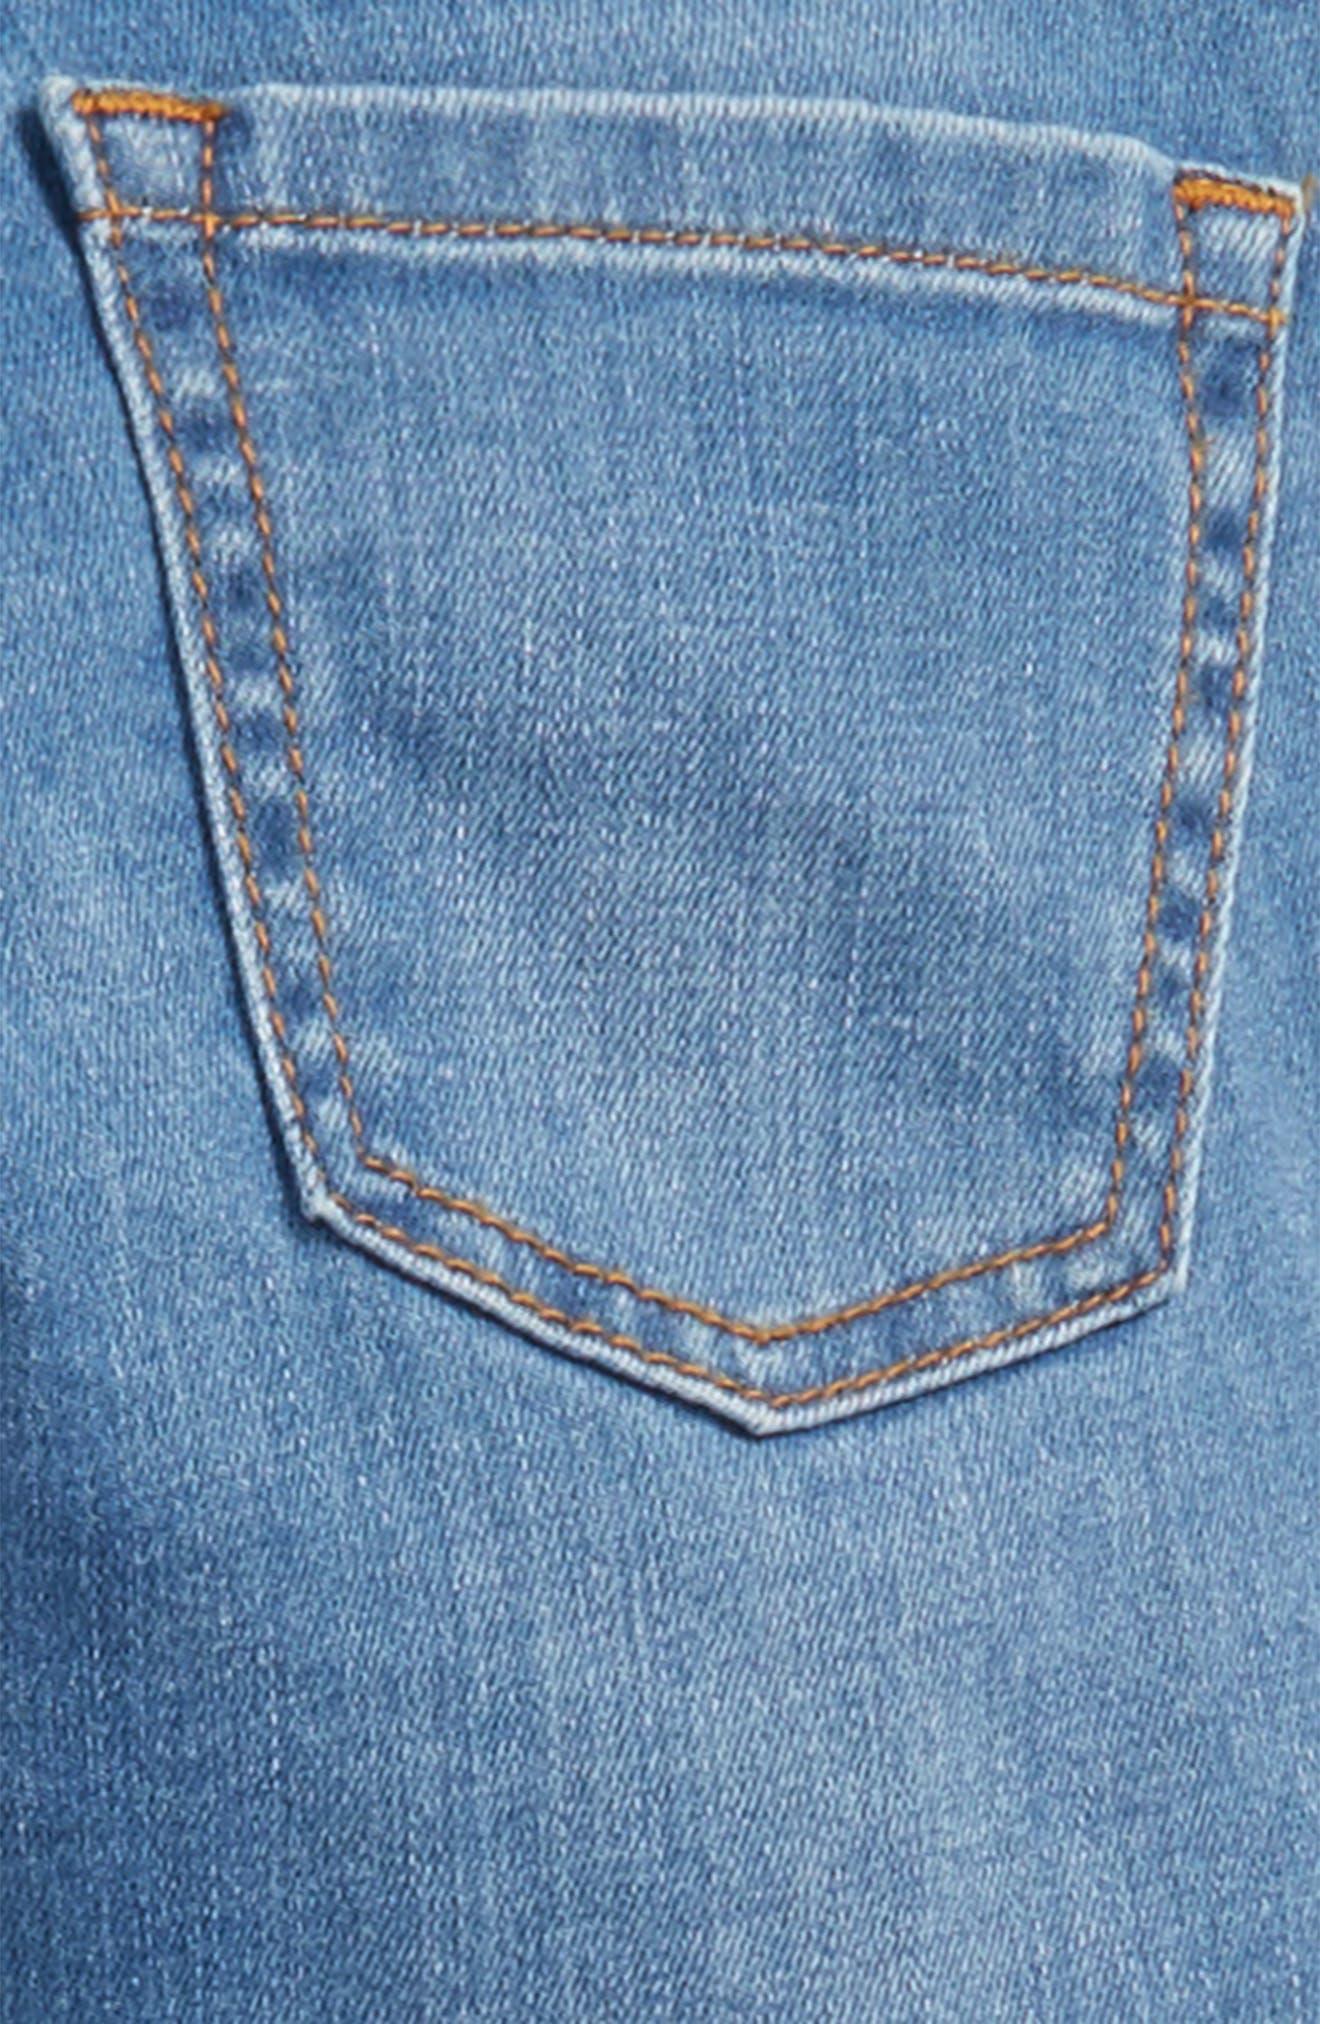 Skinny Jeans,                             Alternate thumbnail 3, color,                             Light Vintage Ldn